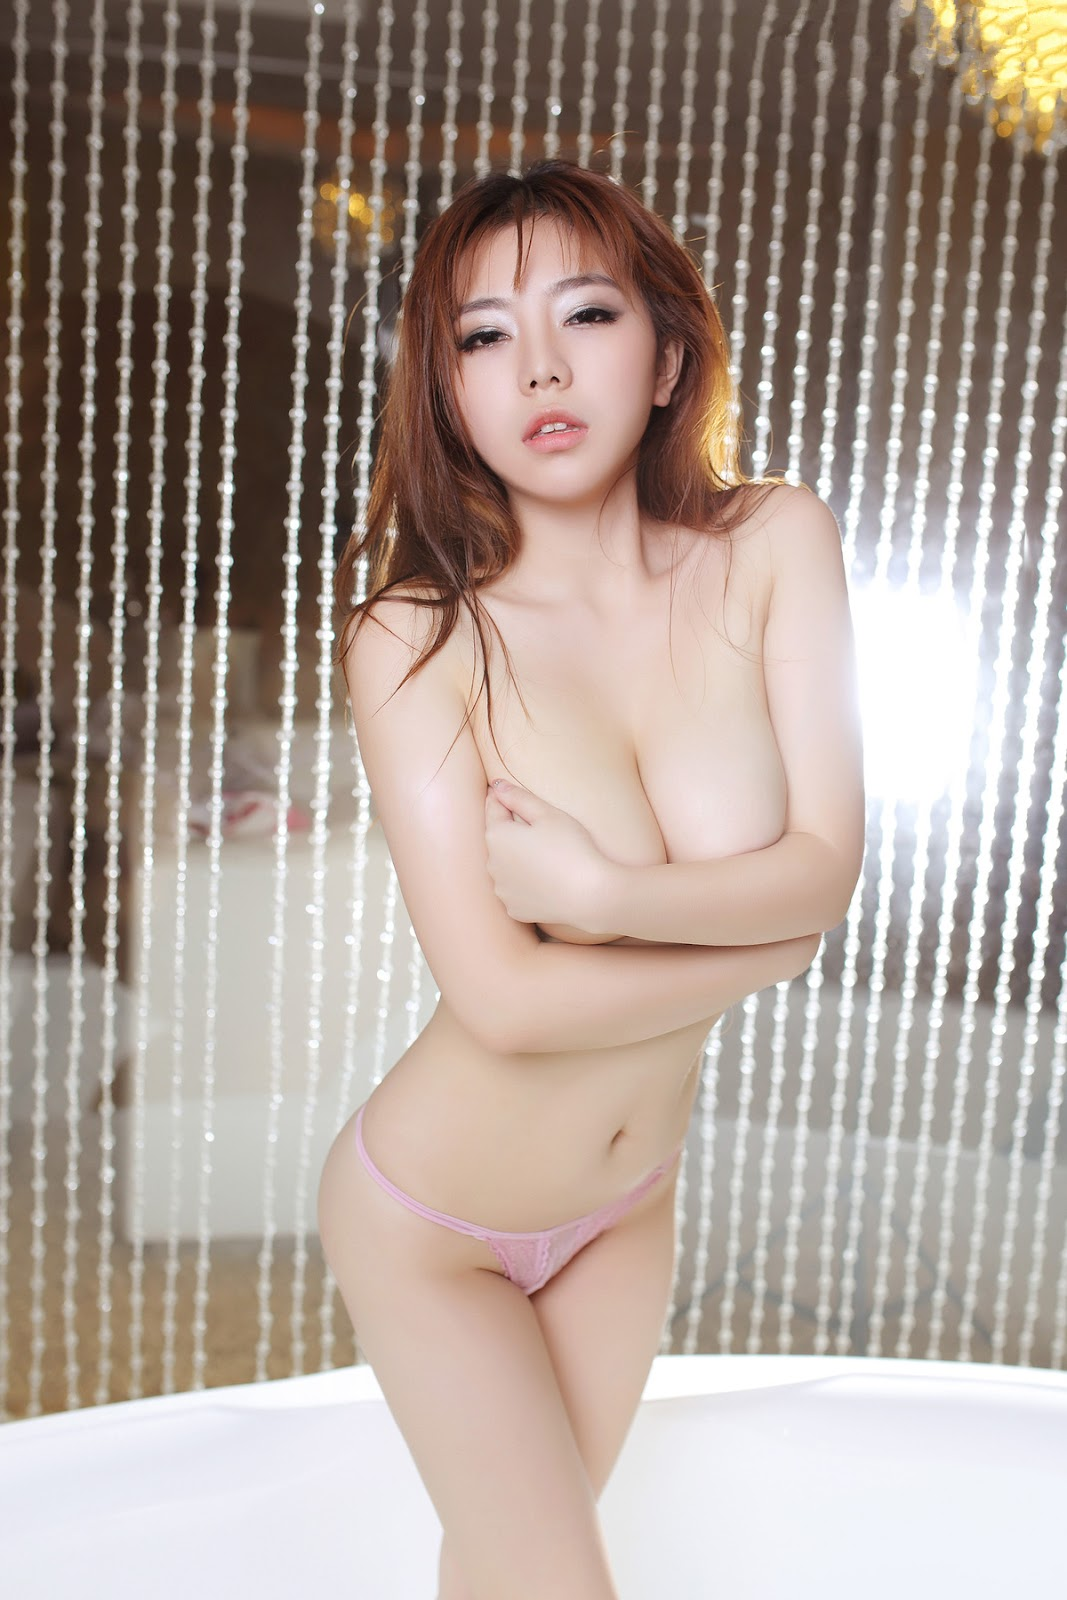 %2529%252B%252B%25C2%25A6%25C2%25B7 15 - TGOD Sexy Nude FAYE